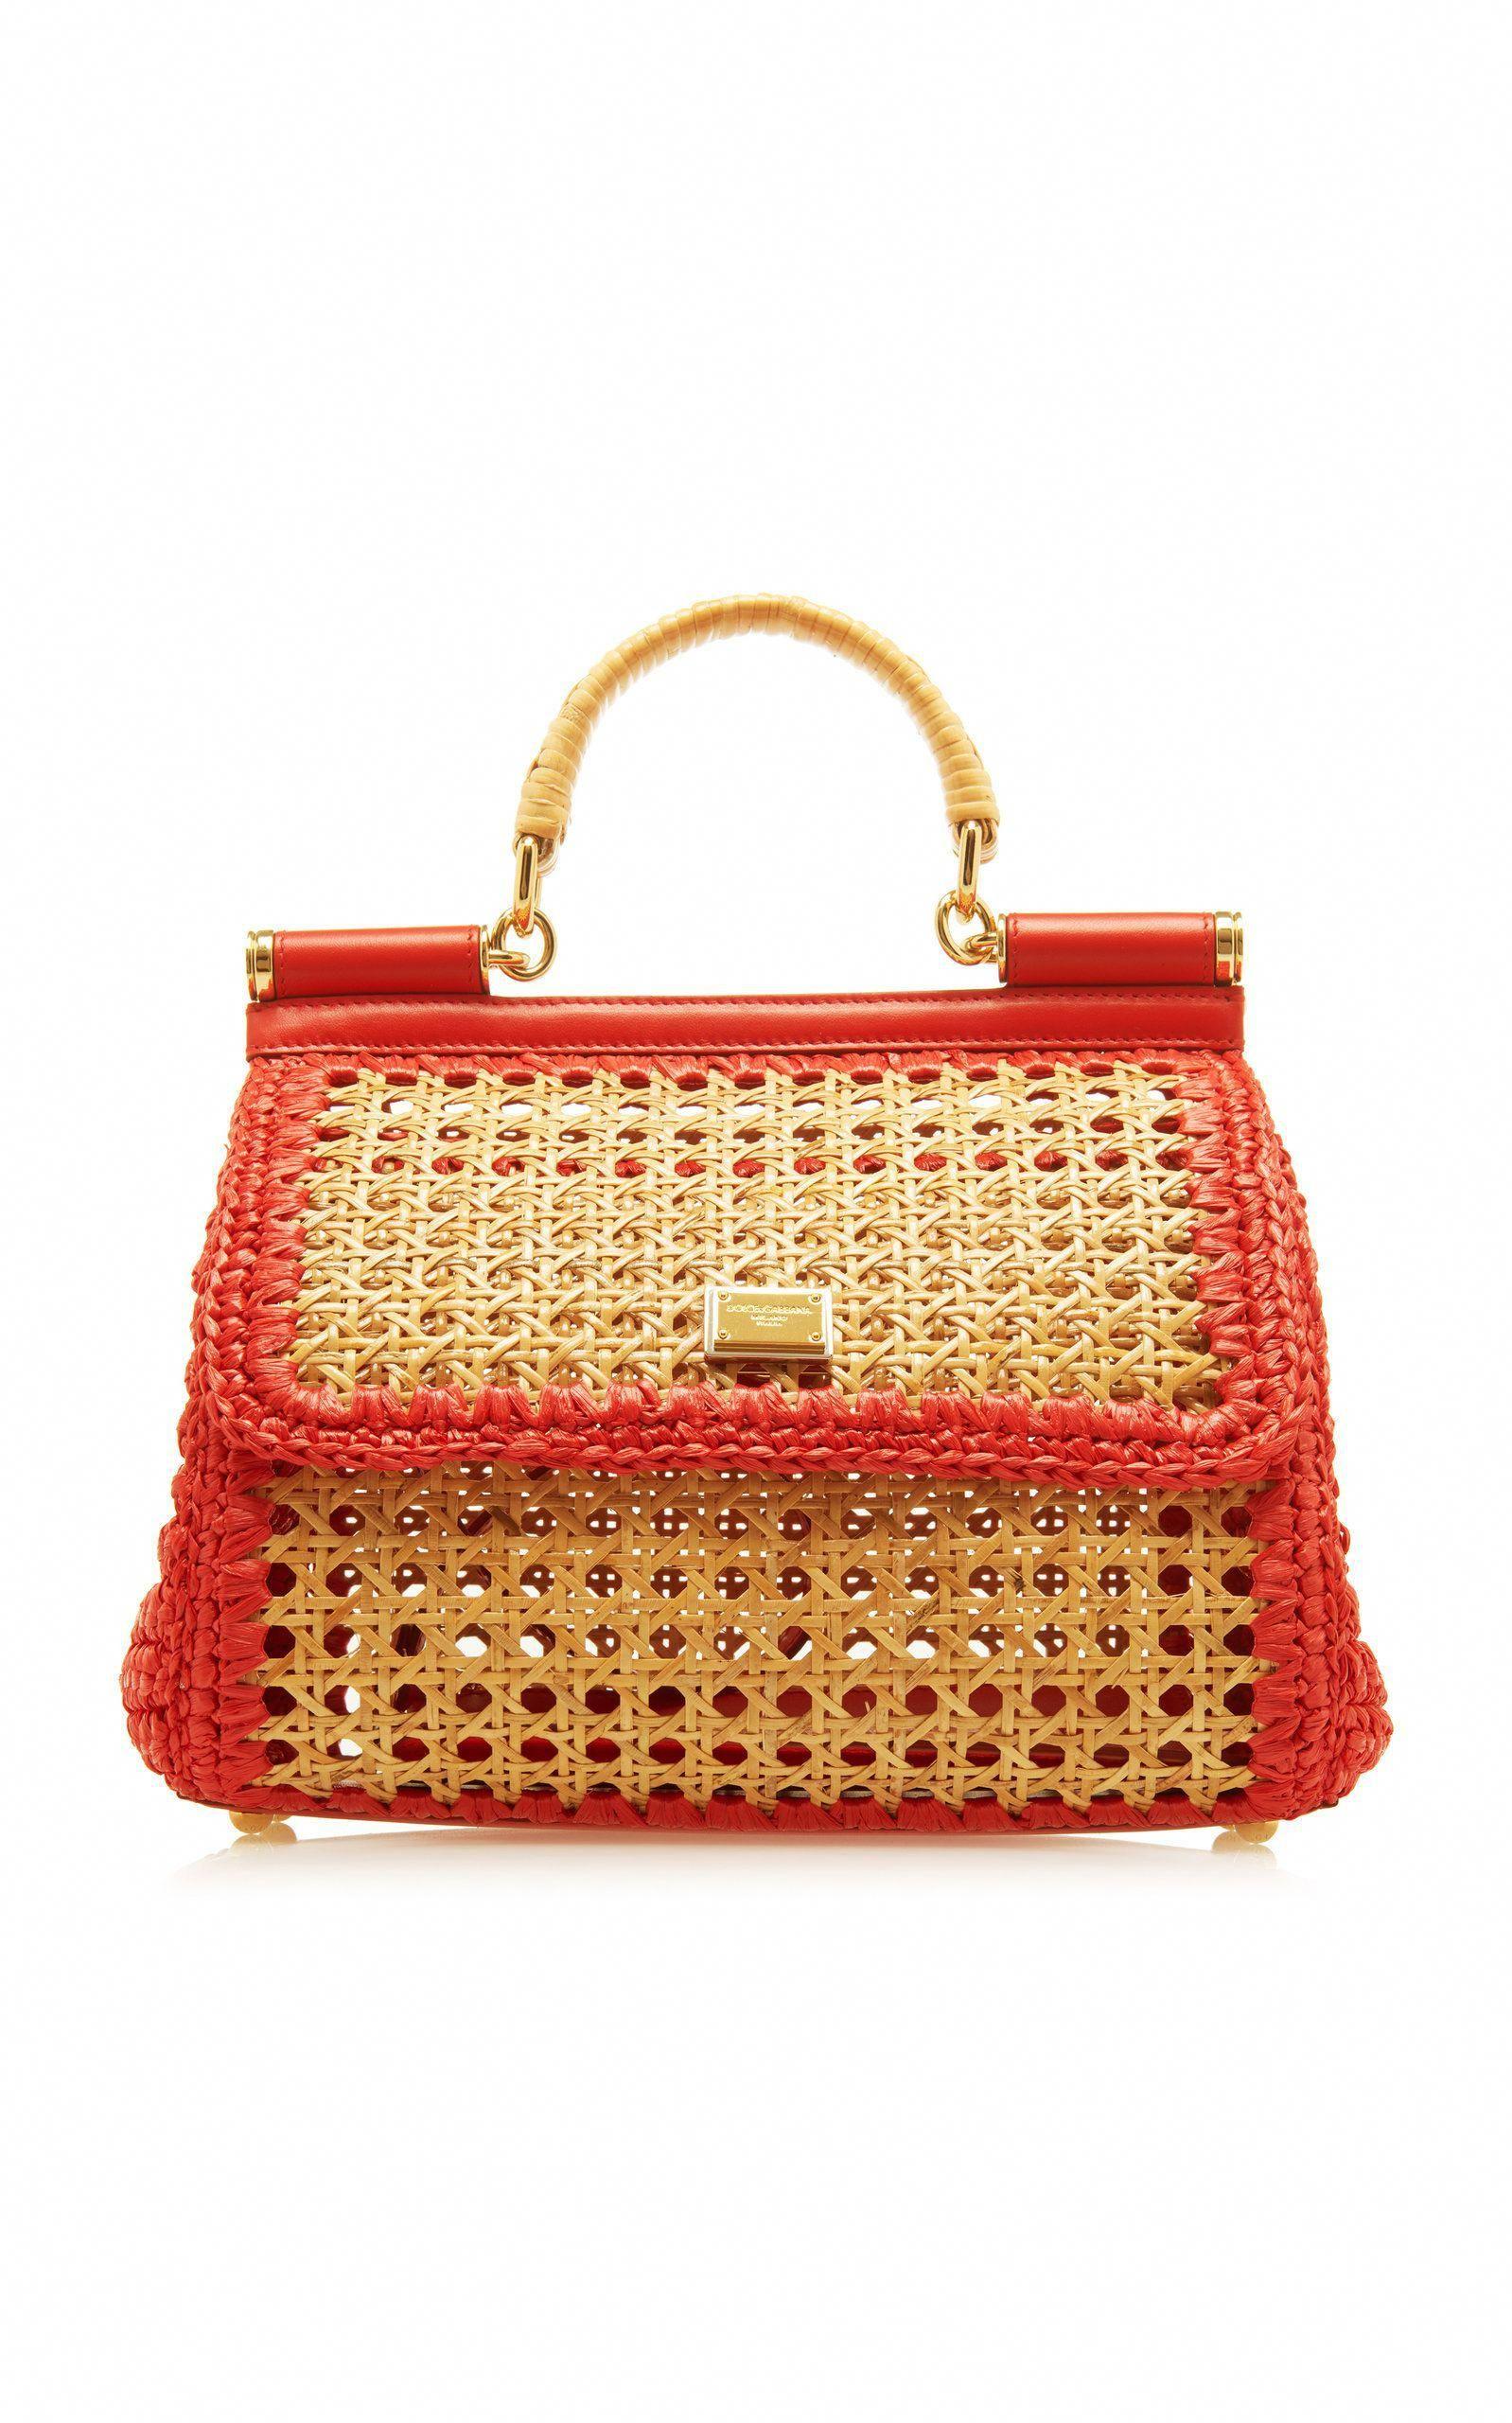 db2fb2d4eab2 Sicily Woven Raffia Bag by DOLCE   GABBANA Now Available on Moda Operandi   GreatwomenhandbagsIdeasIliked